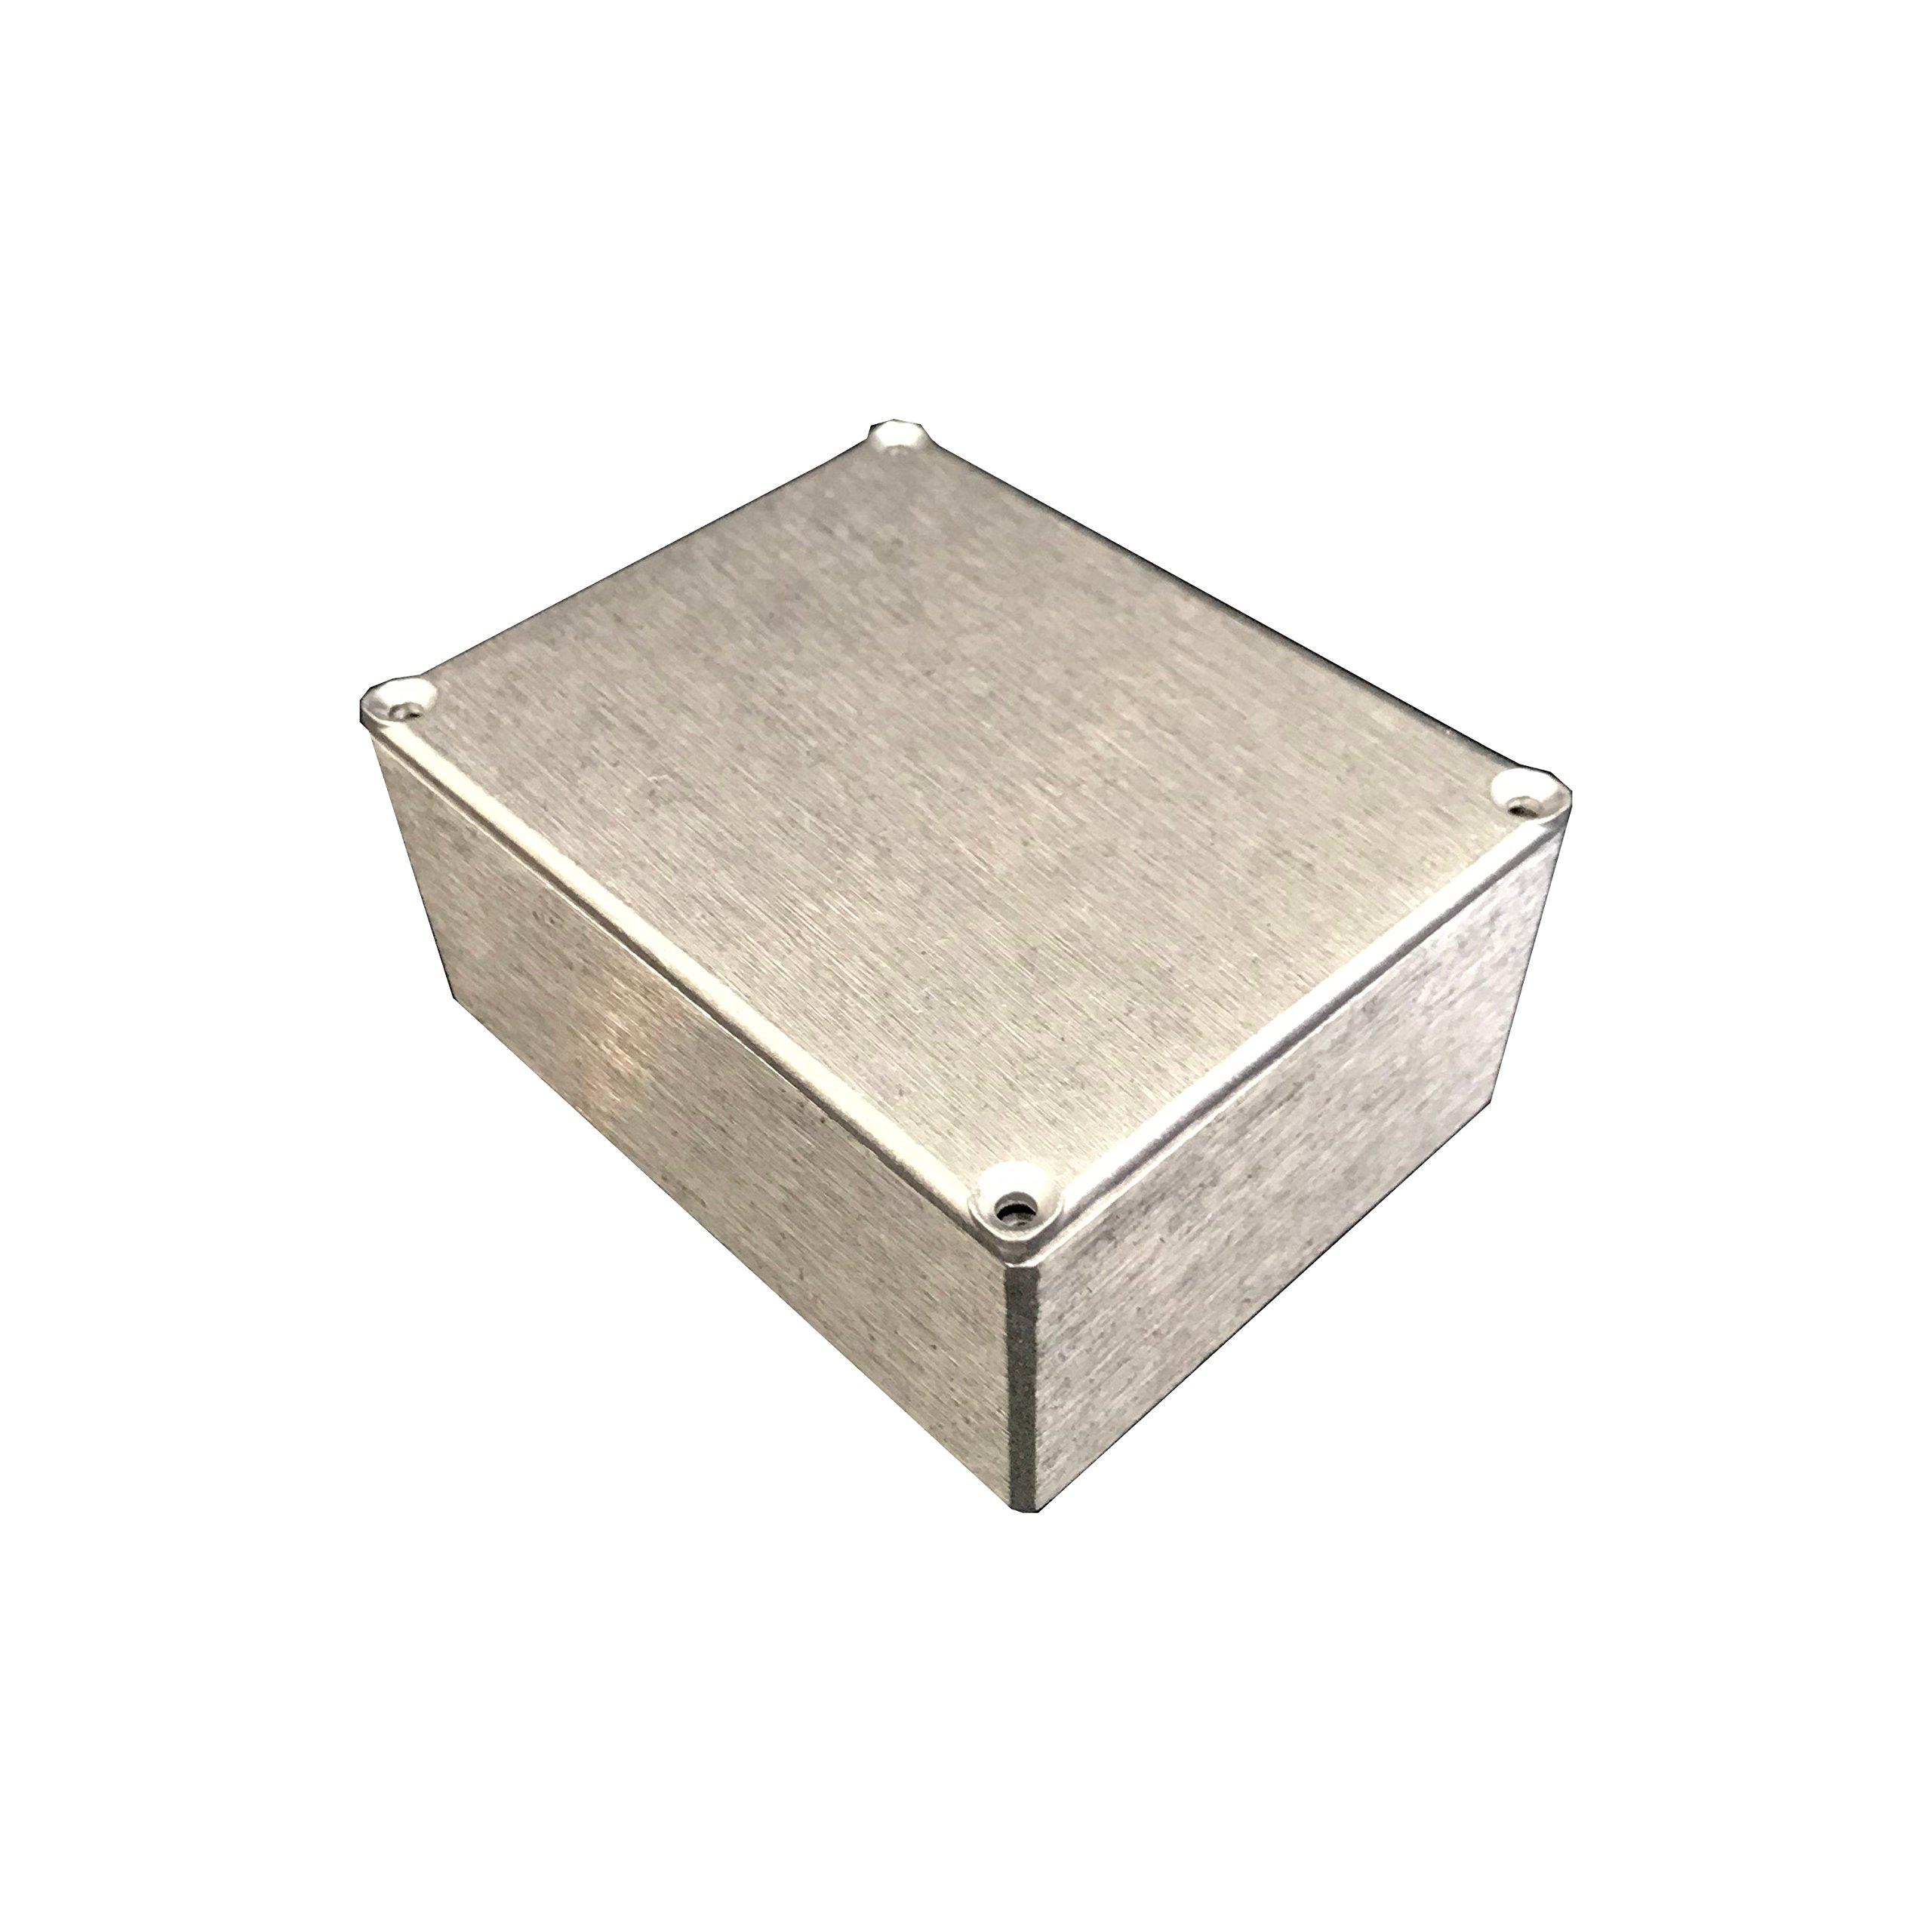 BUD Industries CU-234 Aluminum Econobox, 4-43/64'' Length x 3-43/64'' Width x 2-13/64'' Height, Natural Finish